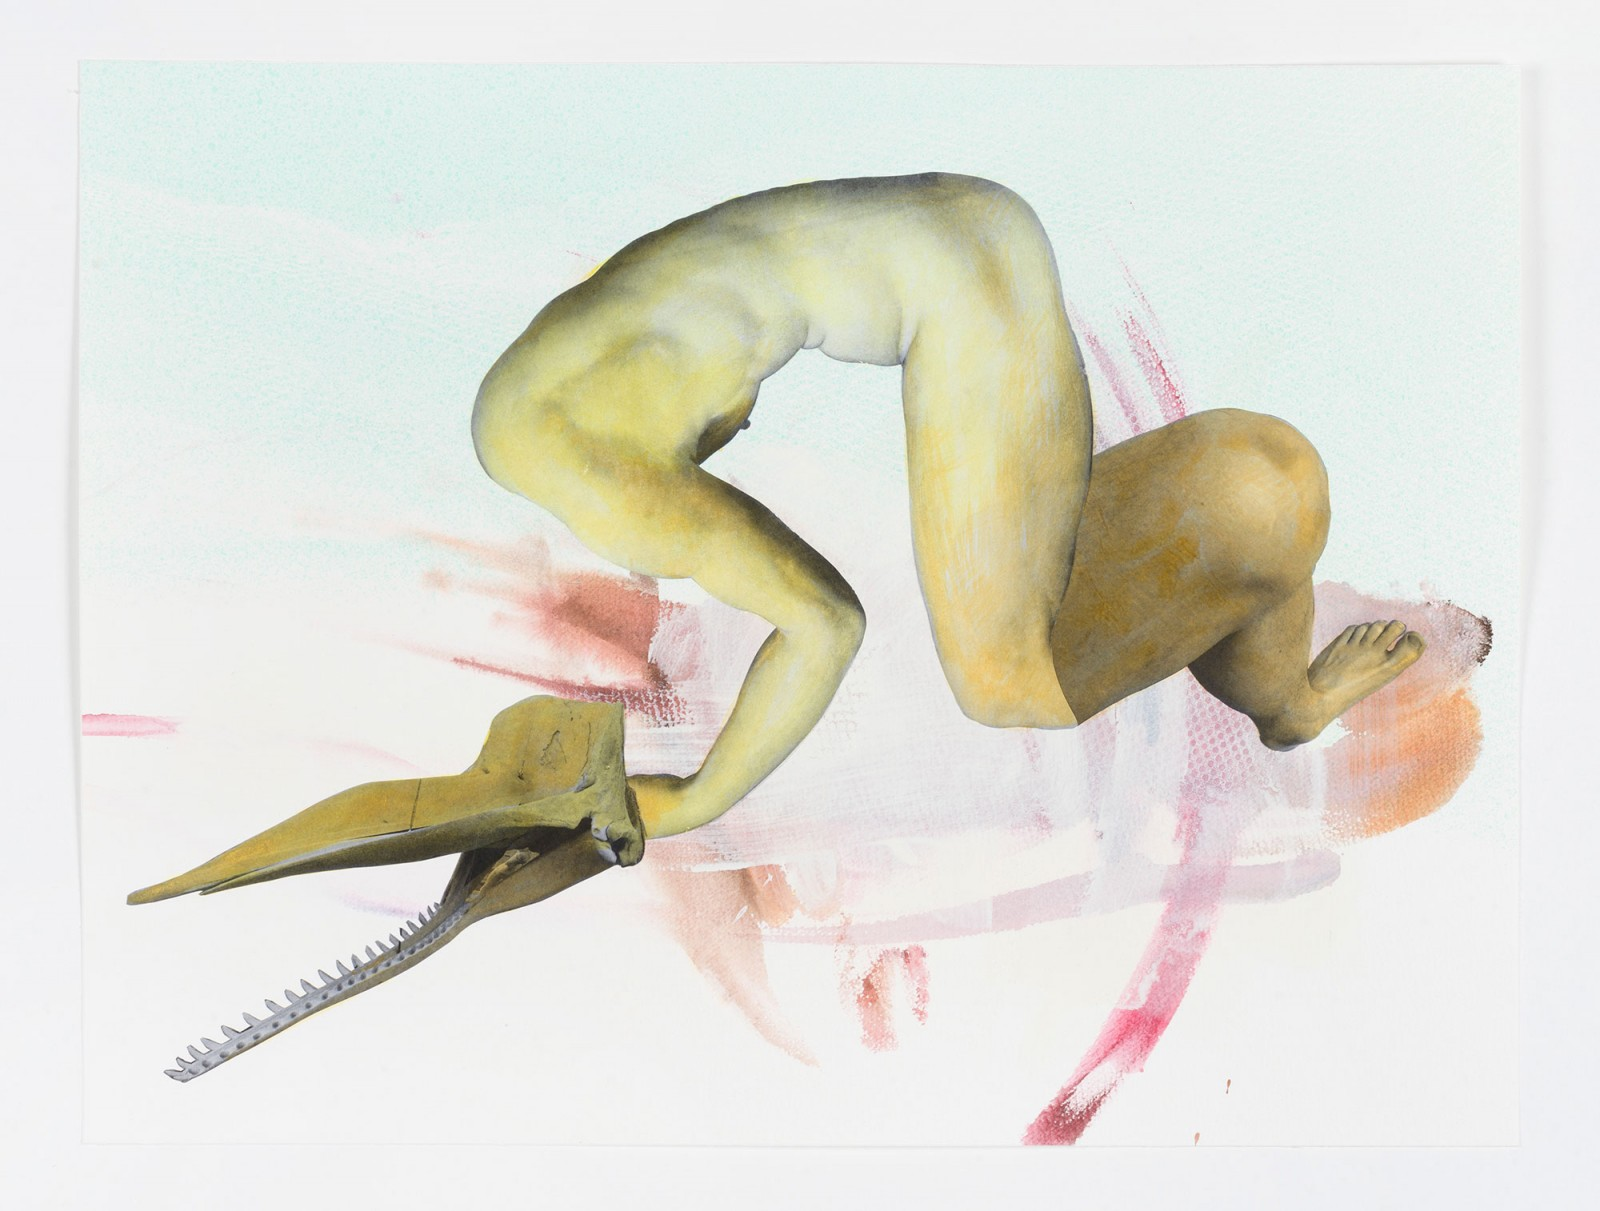 Kim Nekarda: untitled, 2021, watercolor, photocopy & ink on paper, 43 x 57 cm